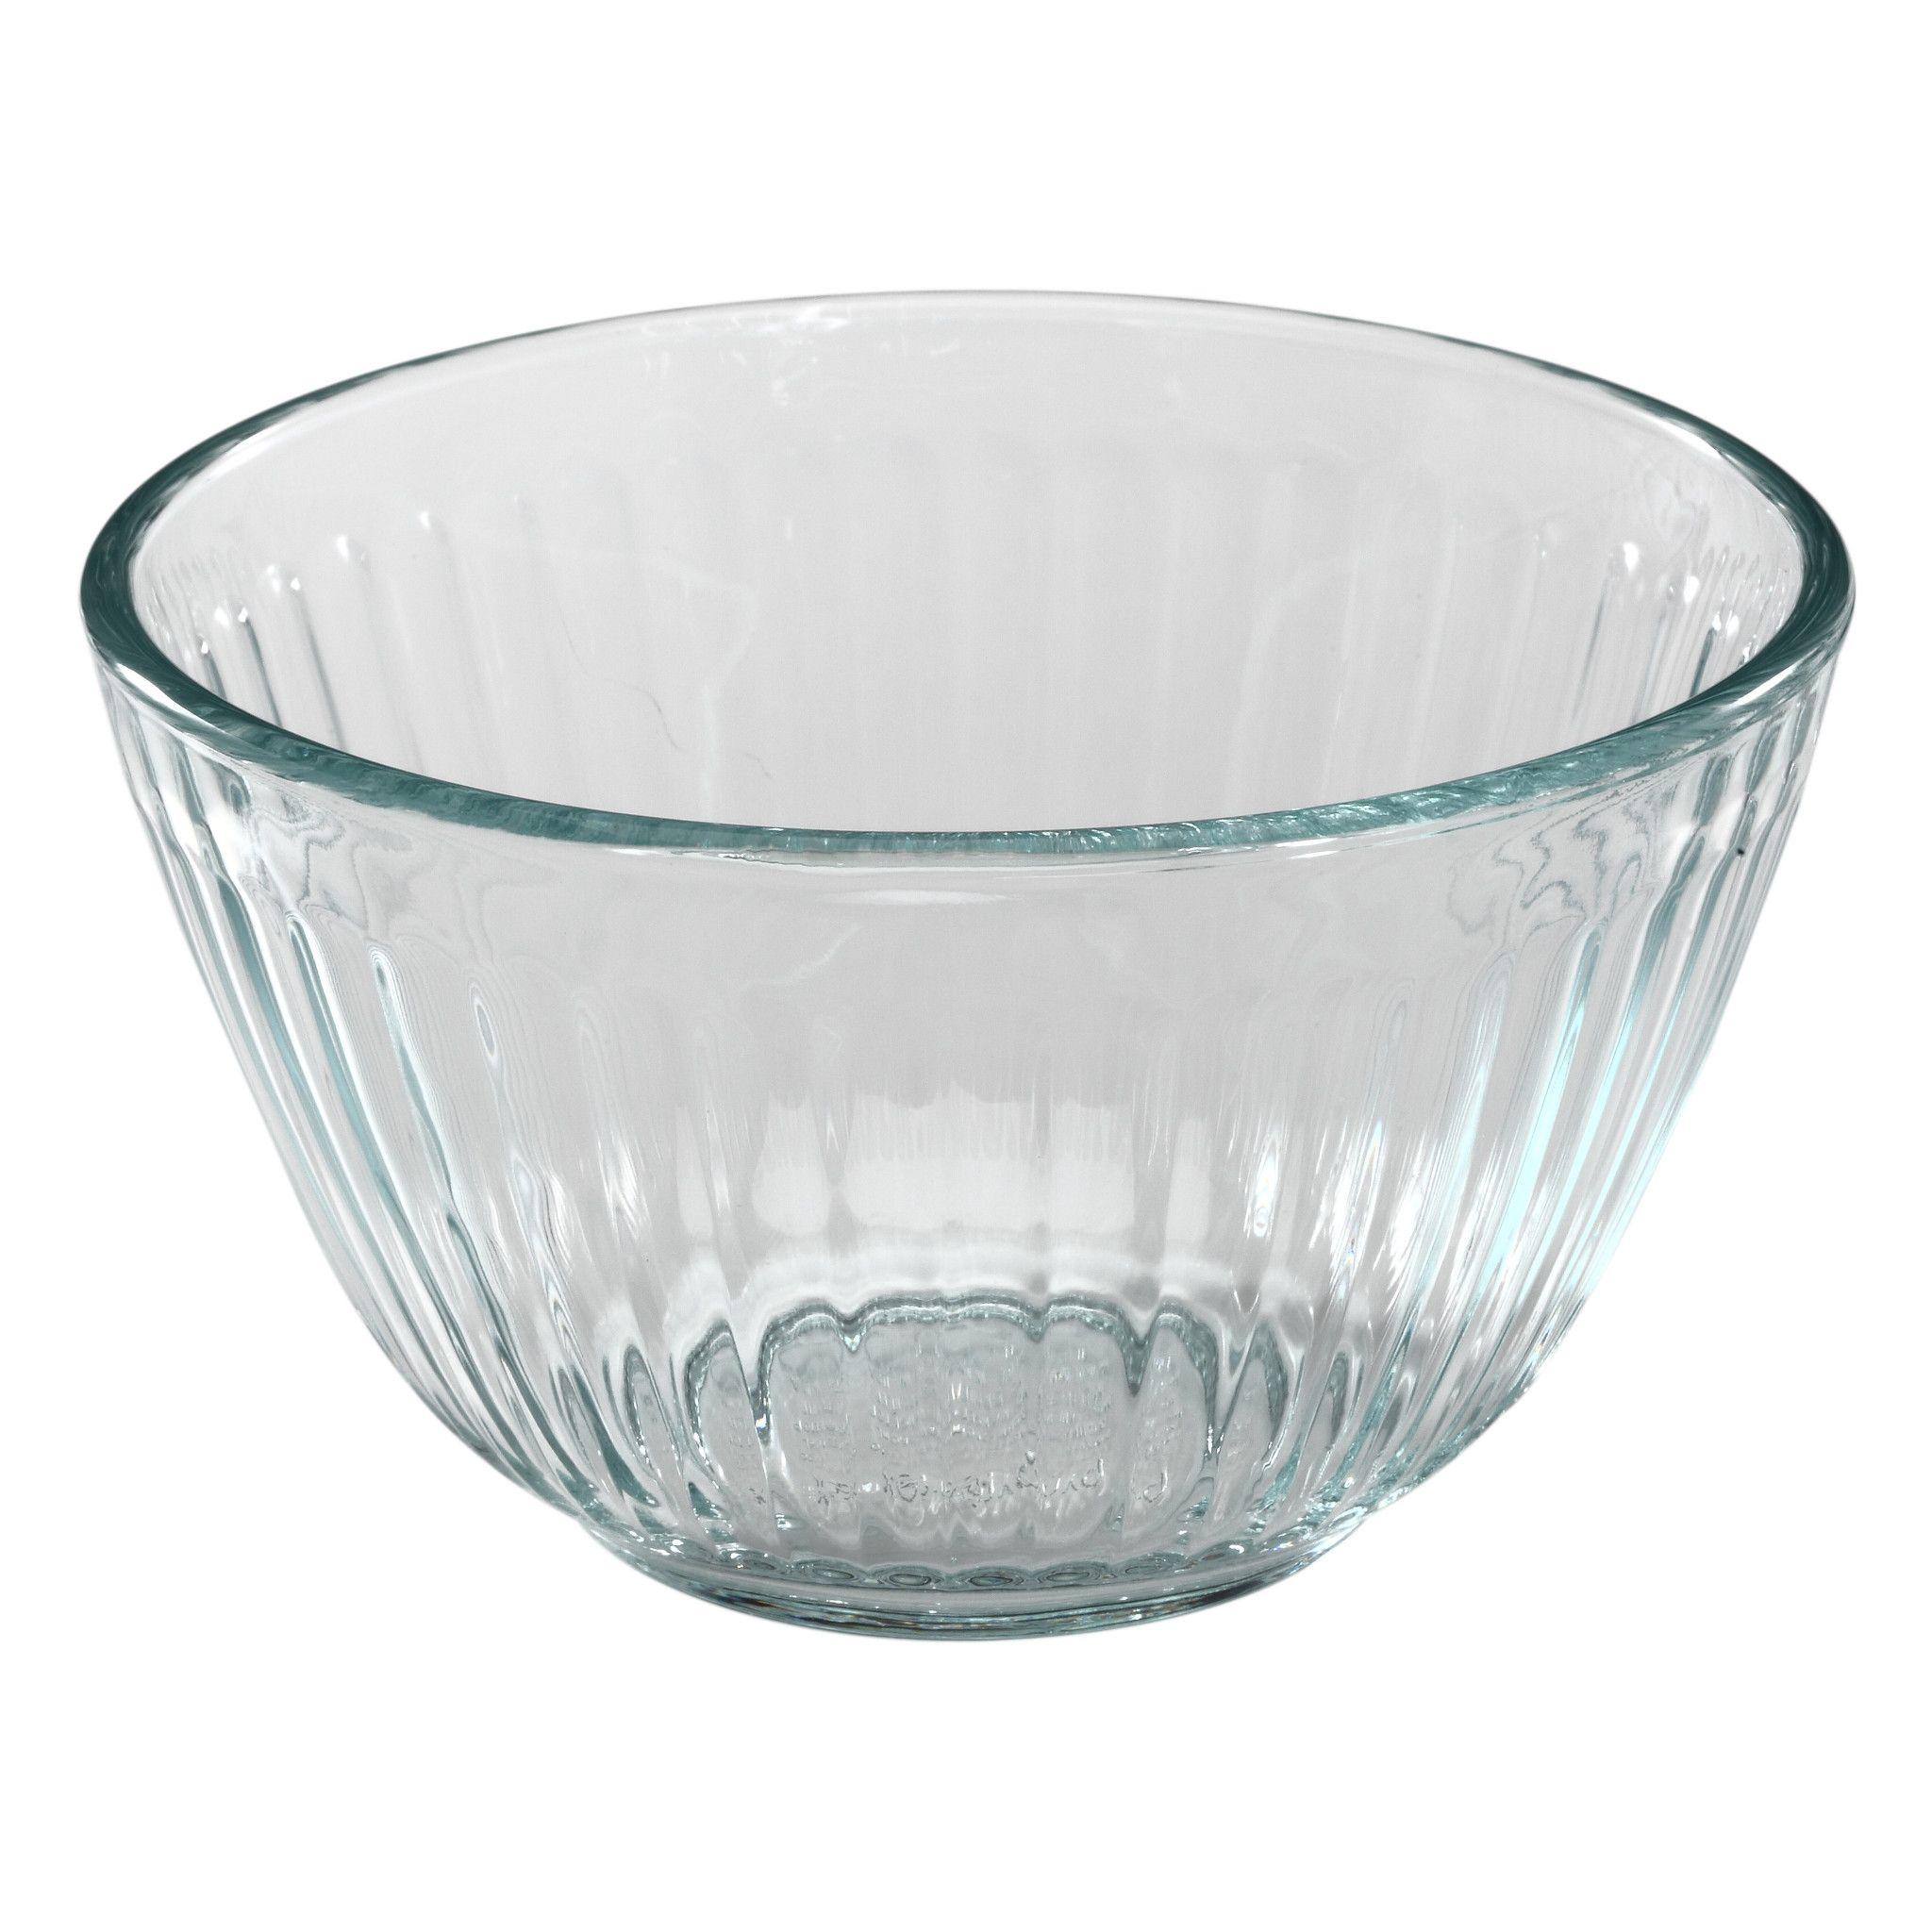 Sculpted 3-cup Mixing Bowl